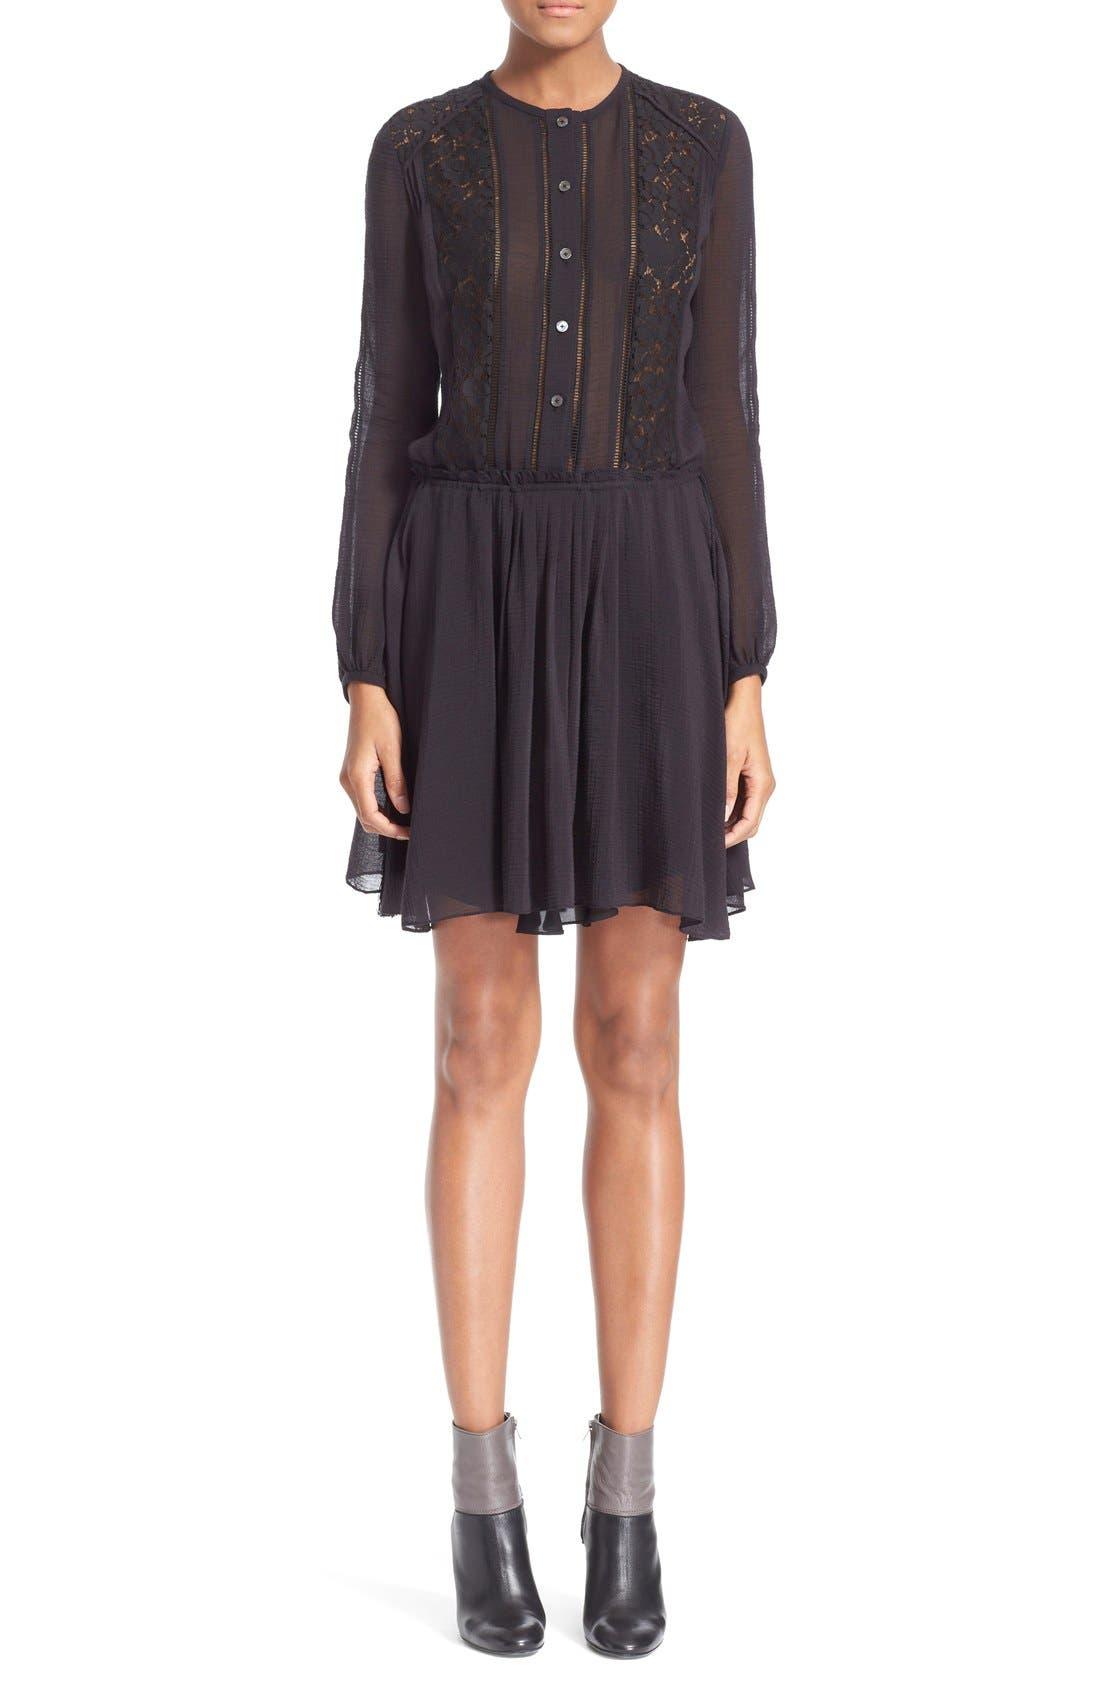 Alternate Image 1 Selected - Derek Lam 10 Crosby Lace Inset Dress